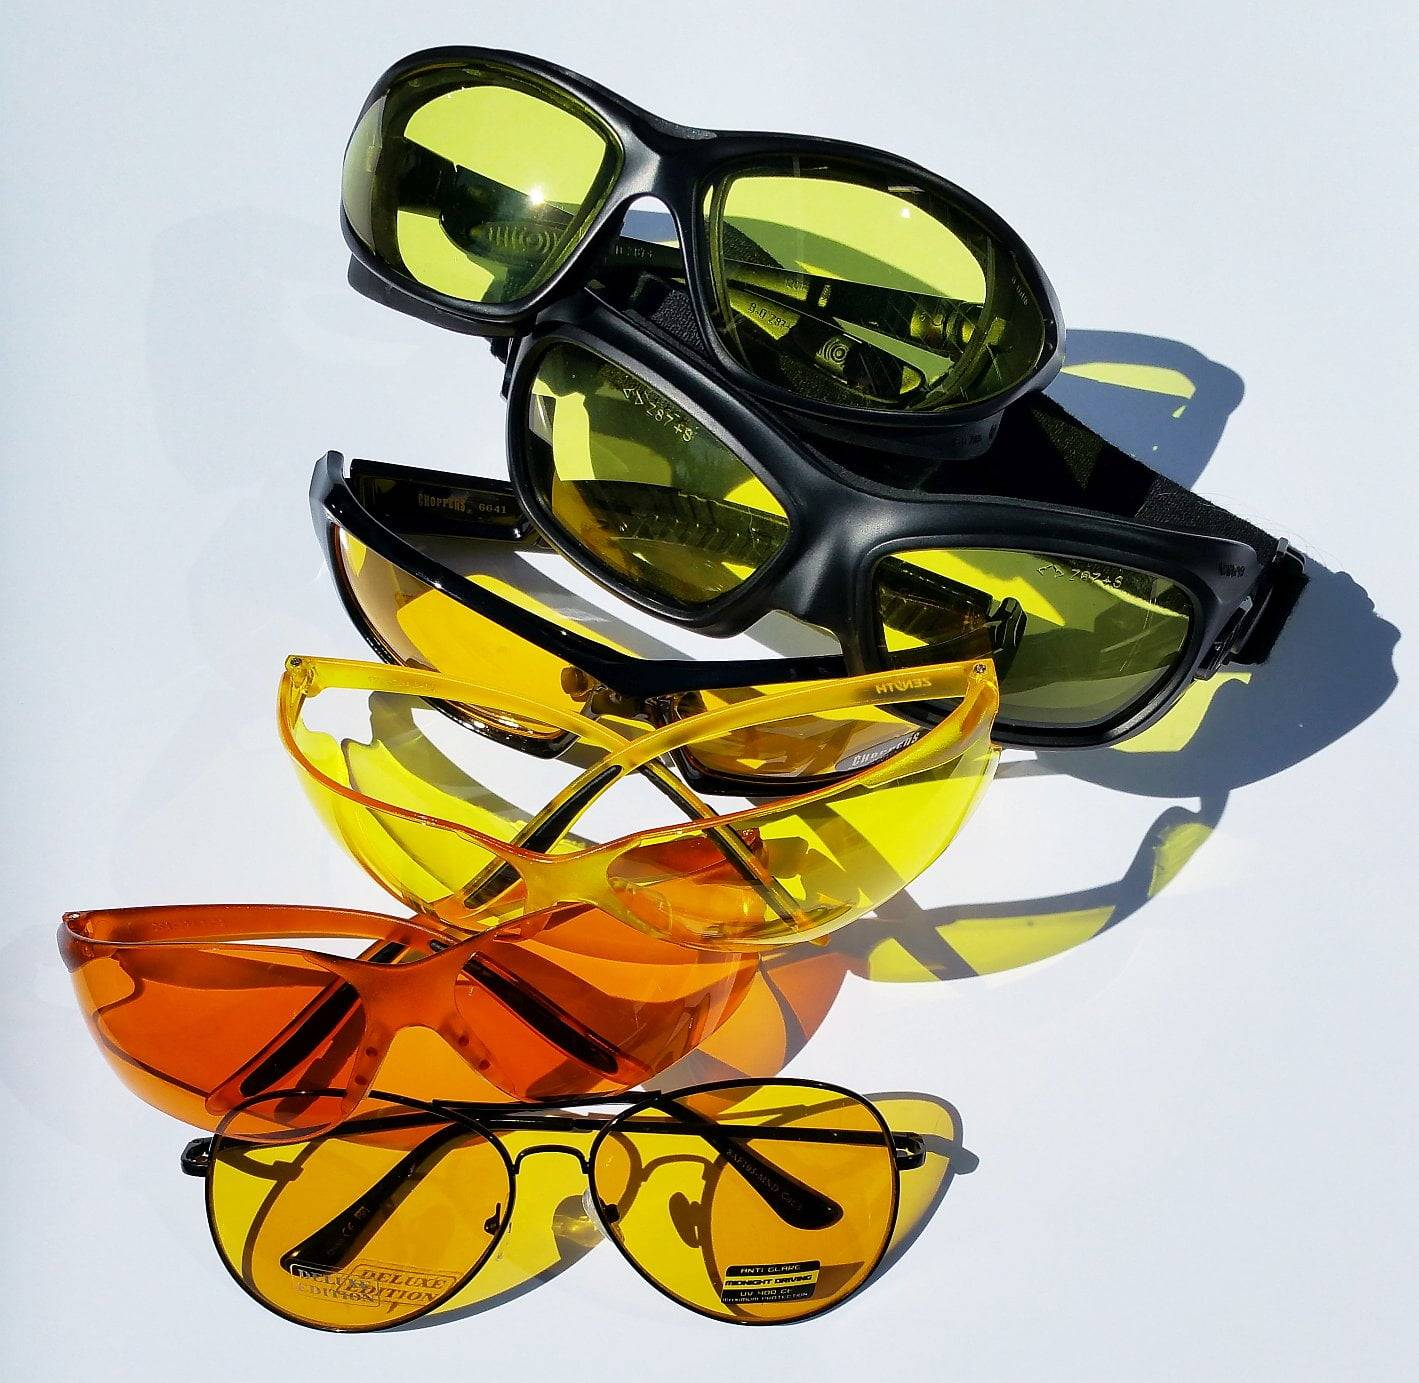 sunglasses-amber-east-side-rerides-2016-09-08b-web